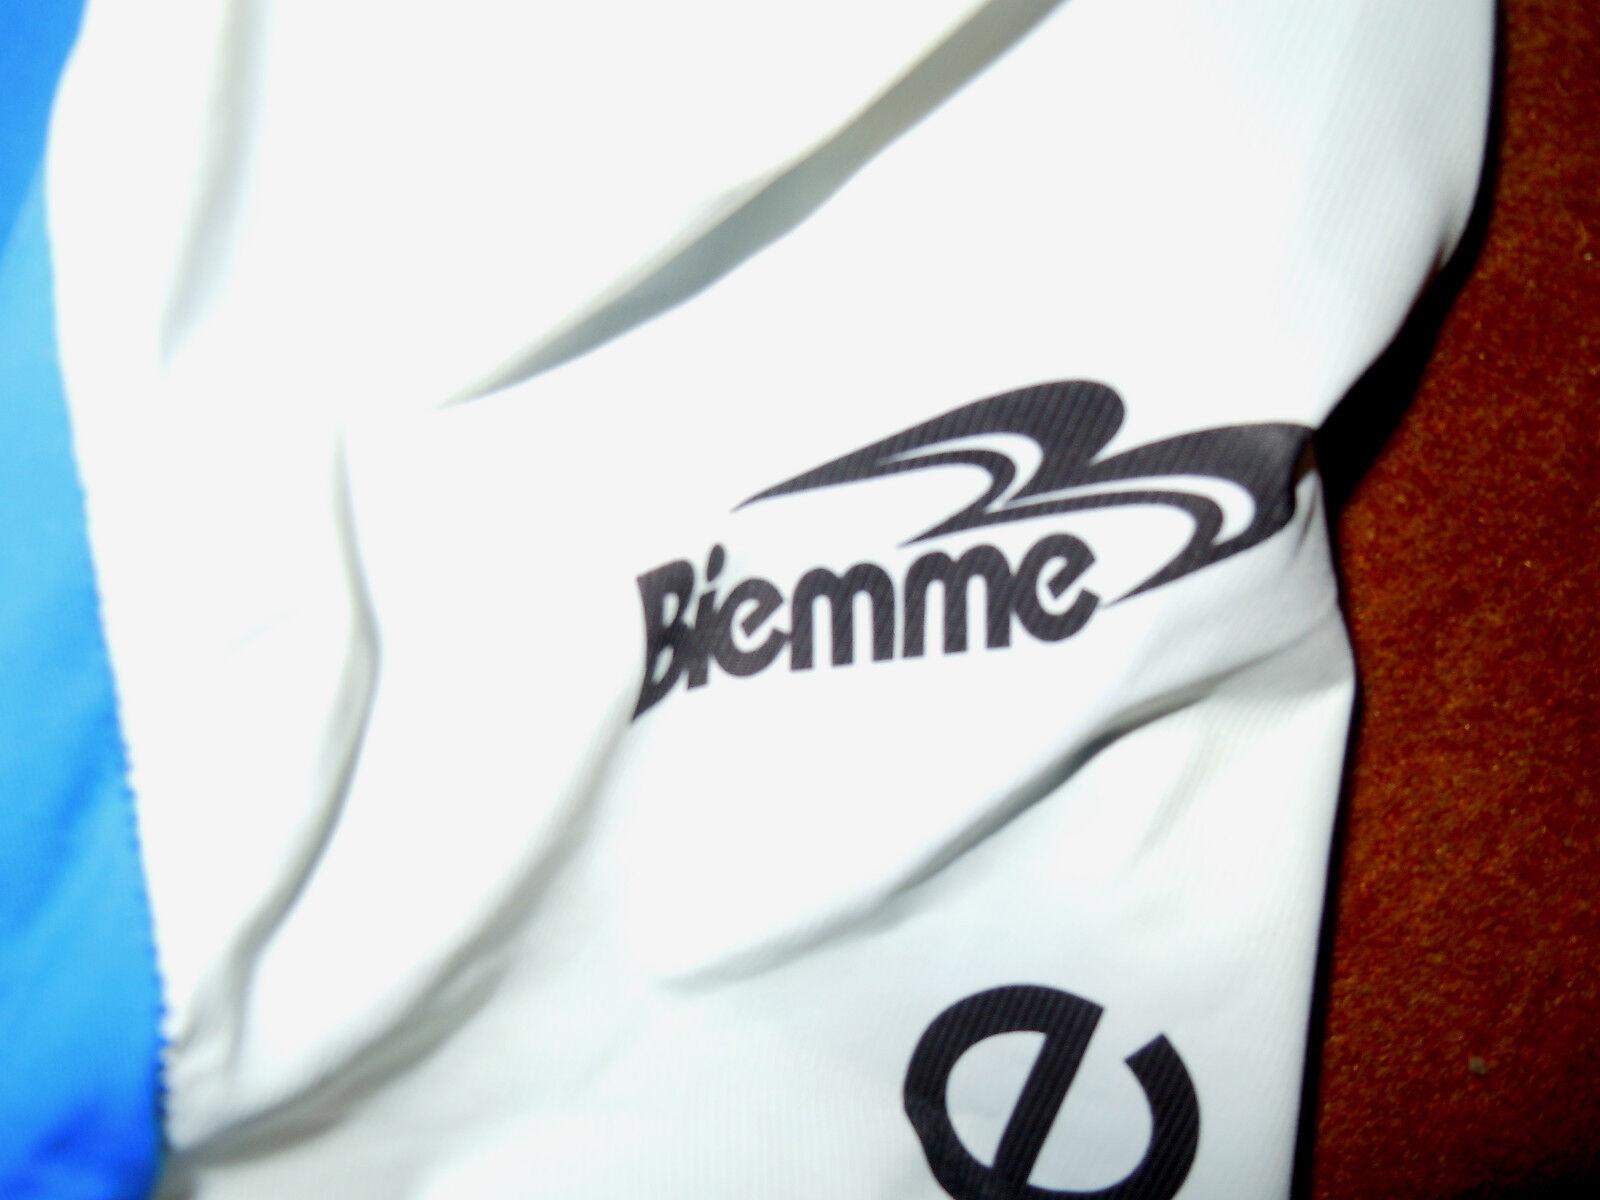 TOP Radrennanzug Gr. S v.BIEMME Technical Raiffeisen Sportswear Raiffeisen Technical Union Team Tirol 5005e9